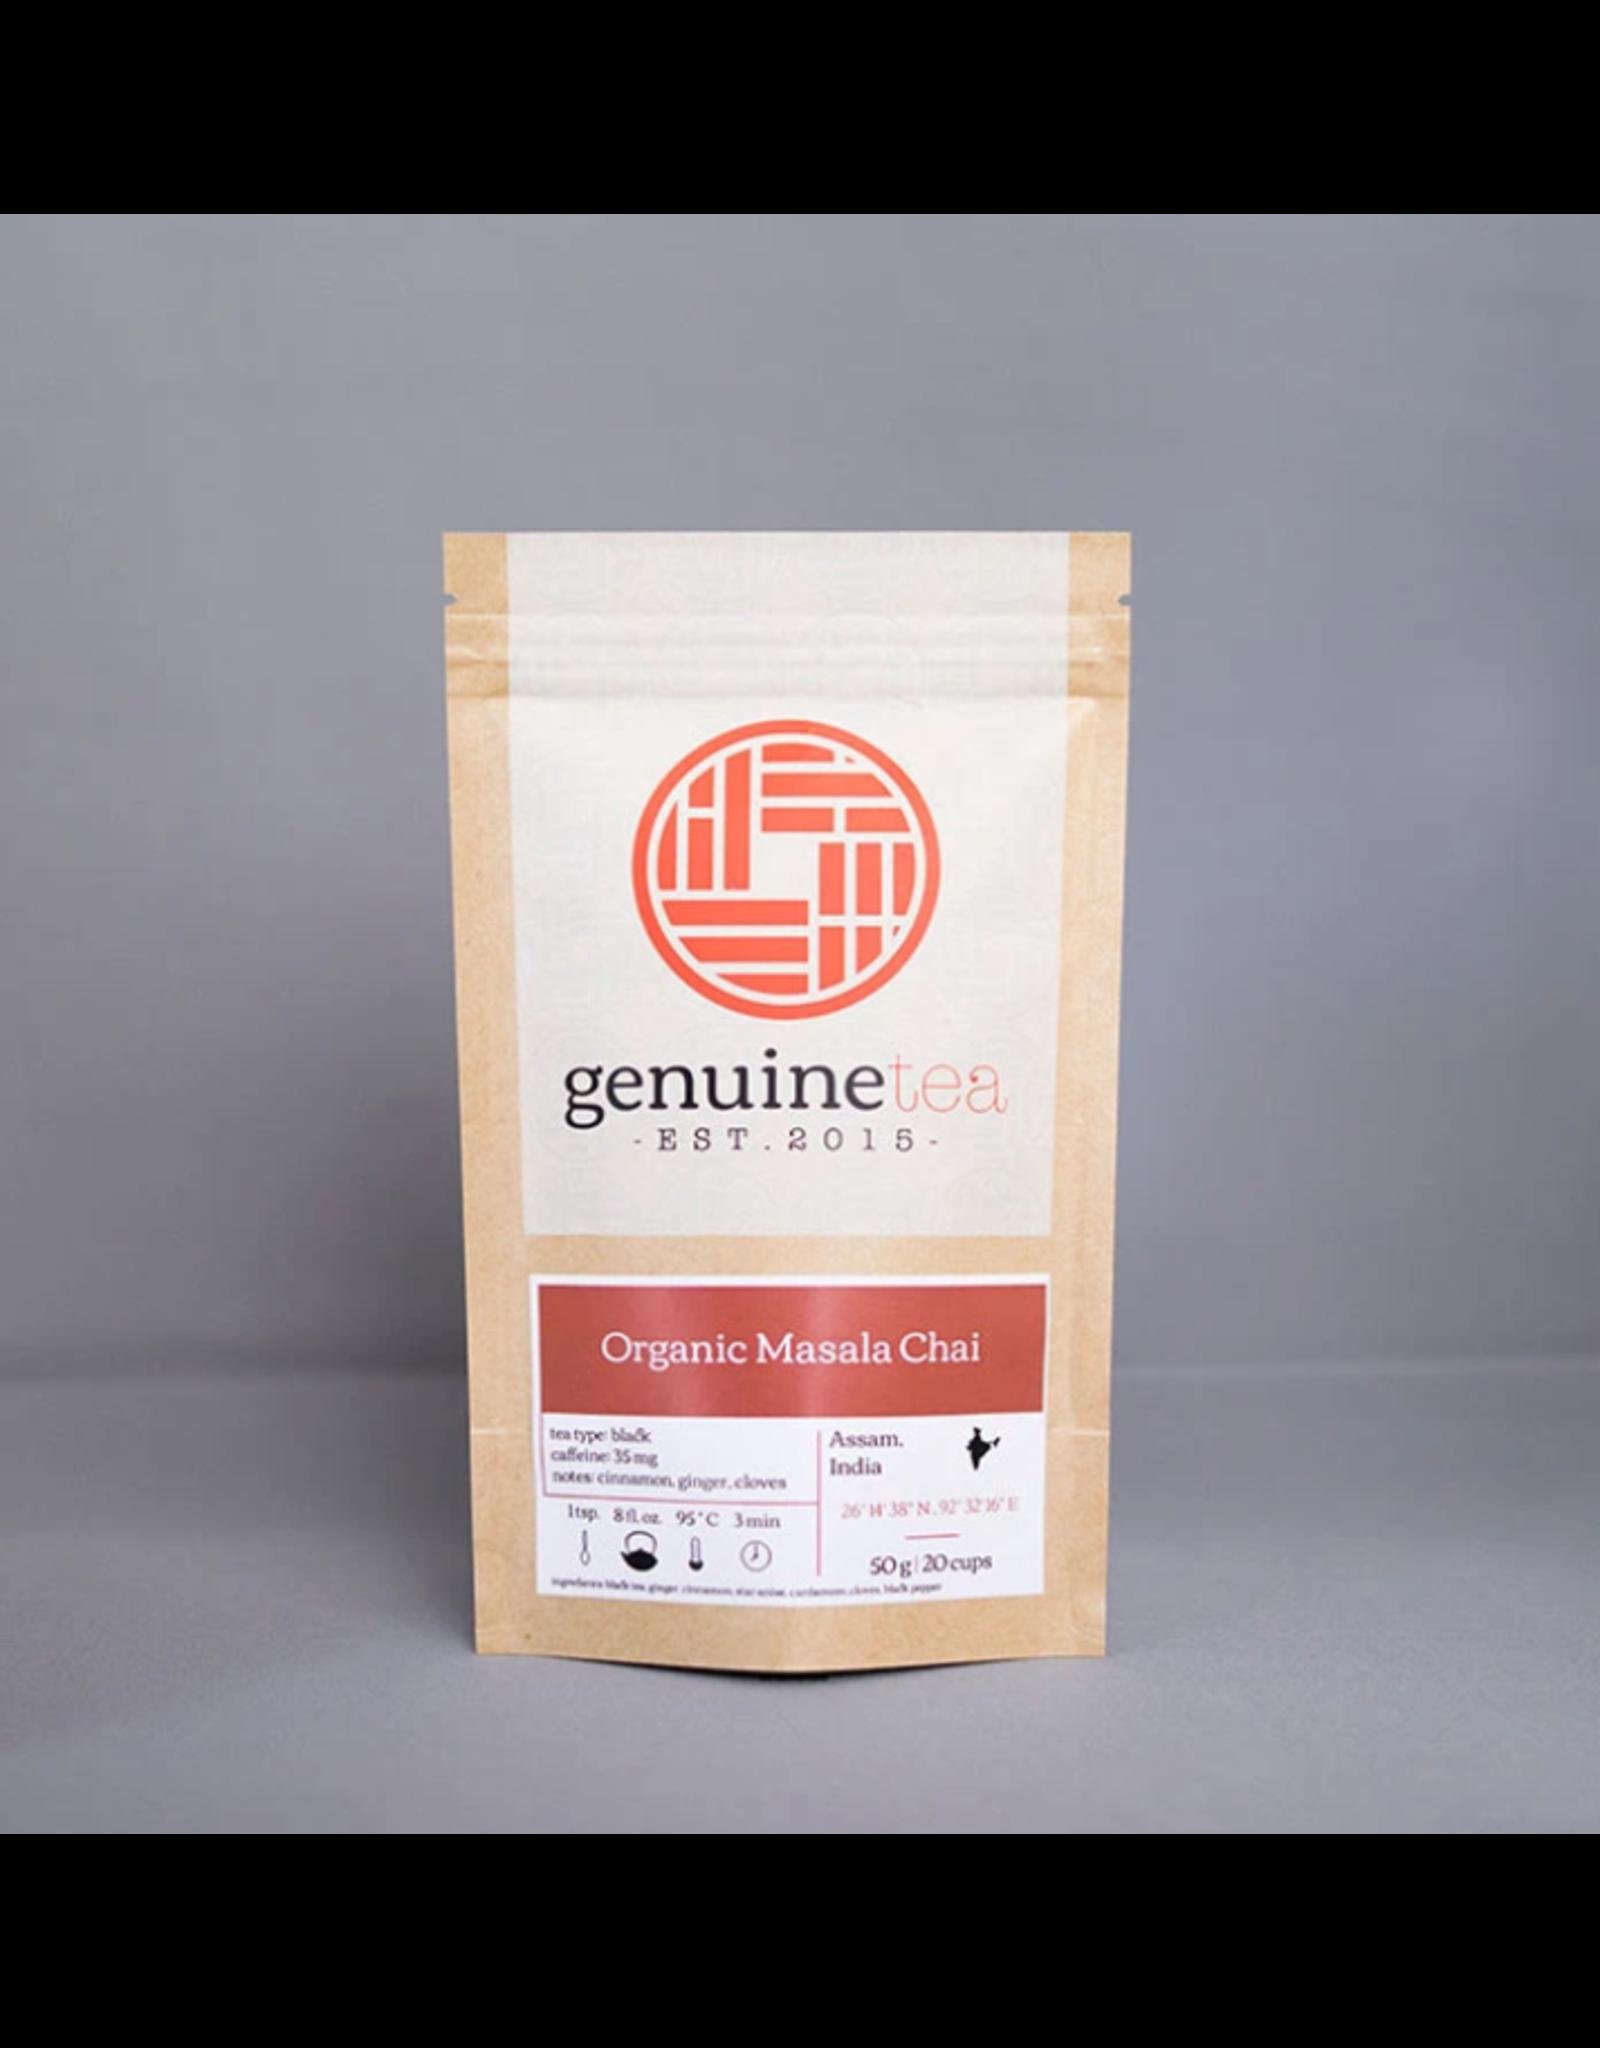 Genuine Tea Genuine Tea, Organic Masala Chai 50g Loose